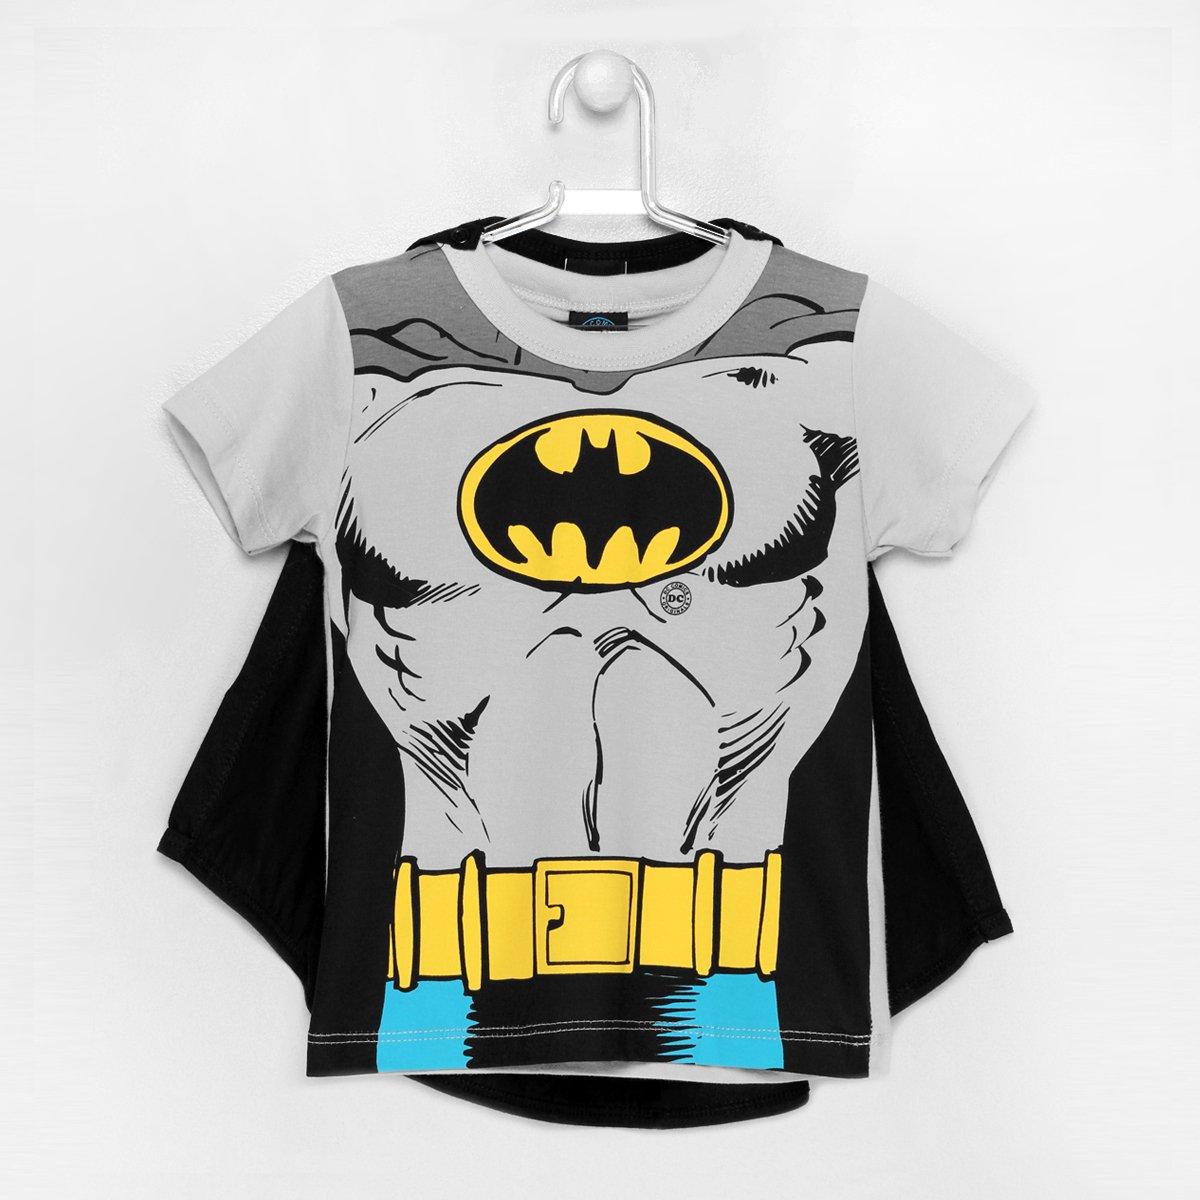 Camiseta Kamylus Batman Capa - Compre Agora  02ce5d1ee11